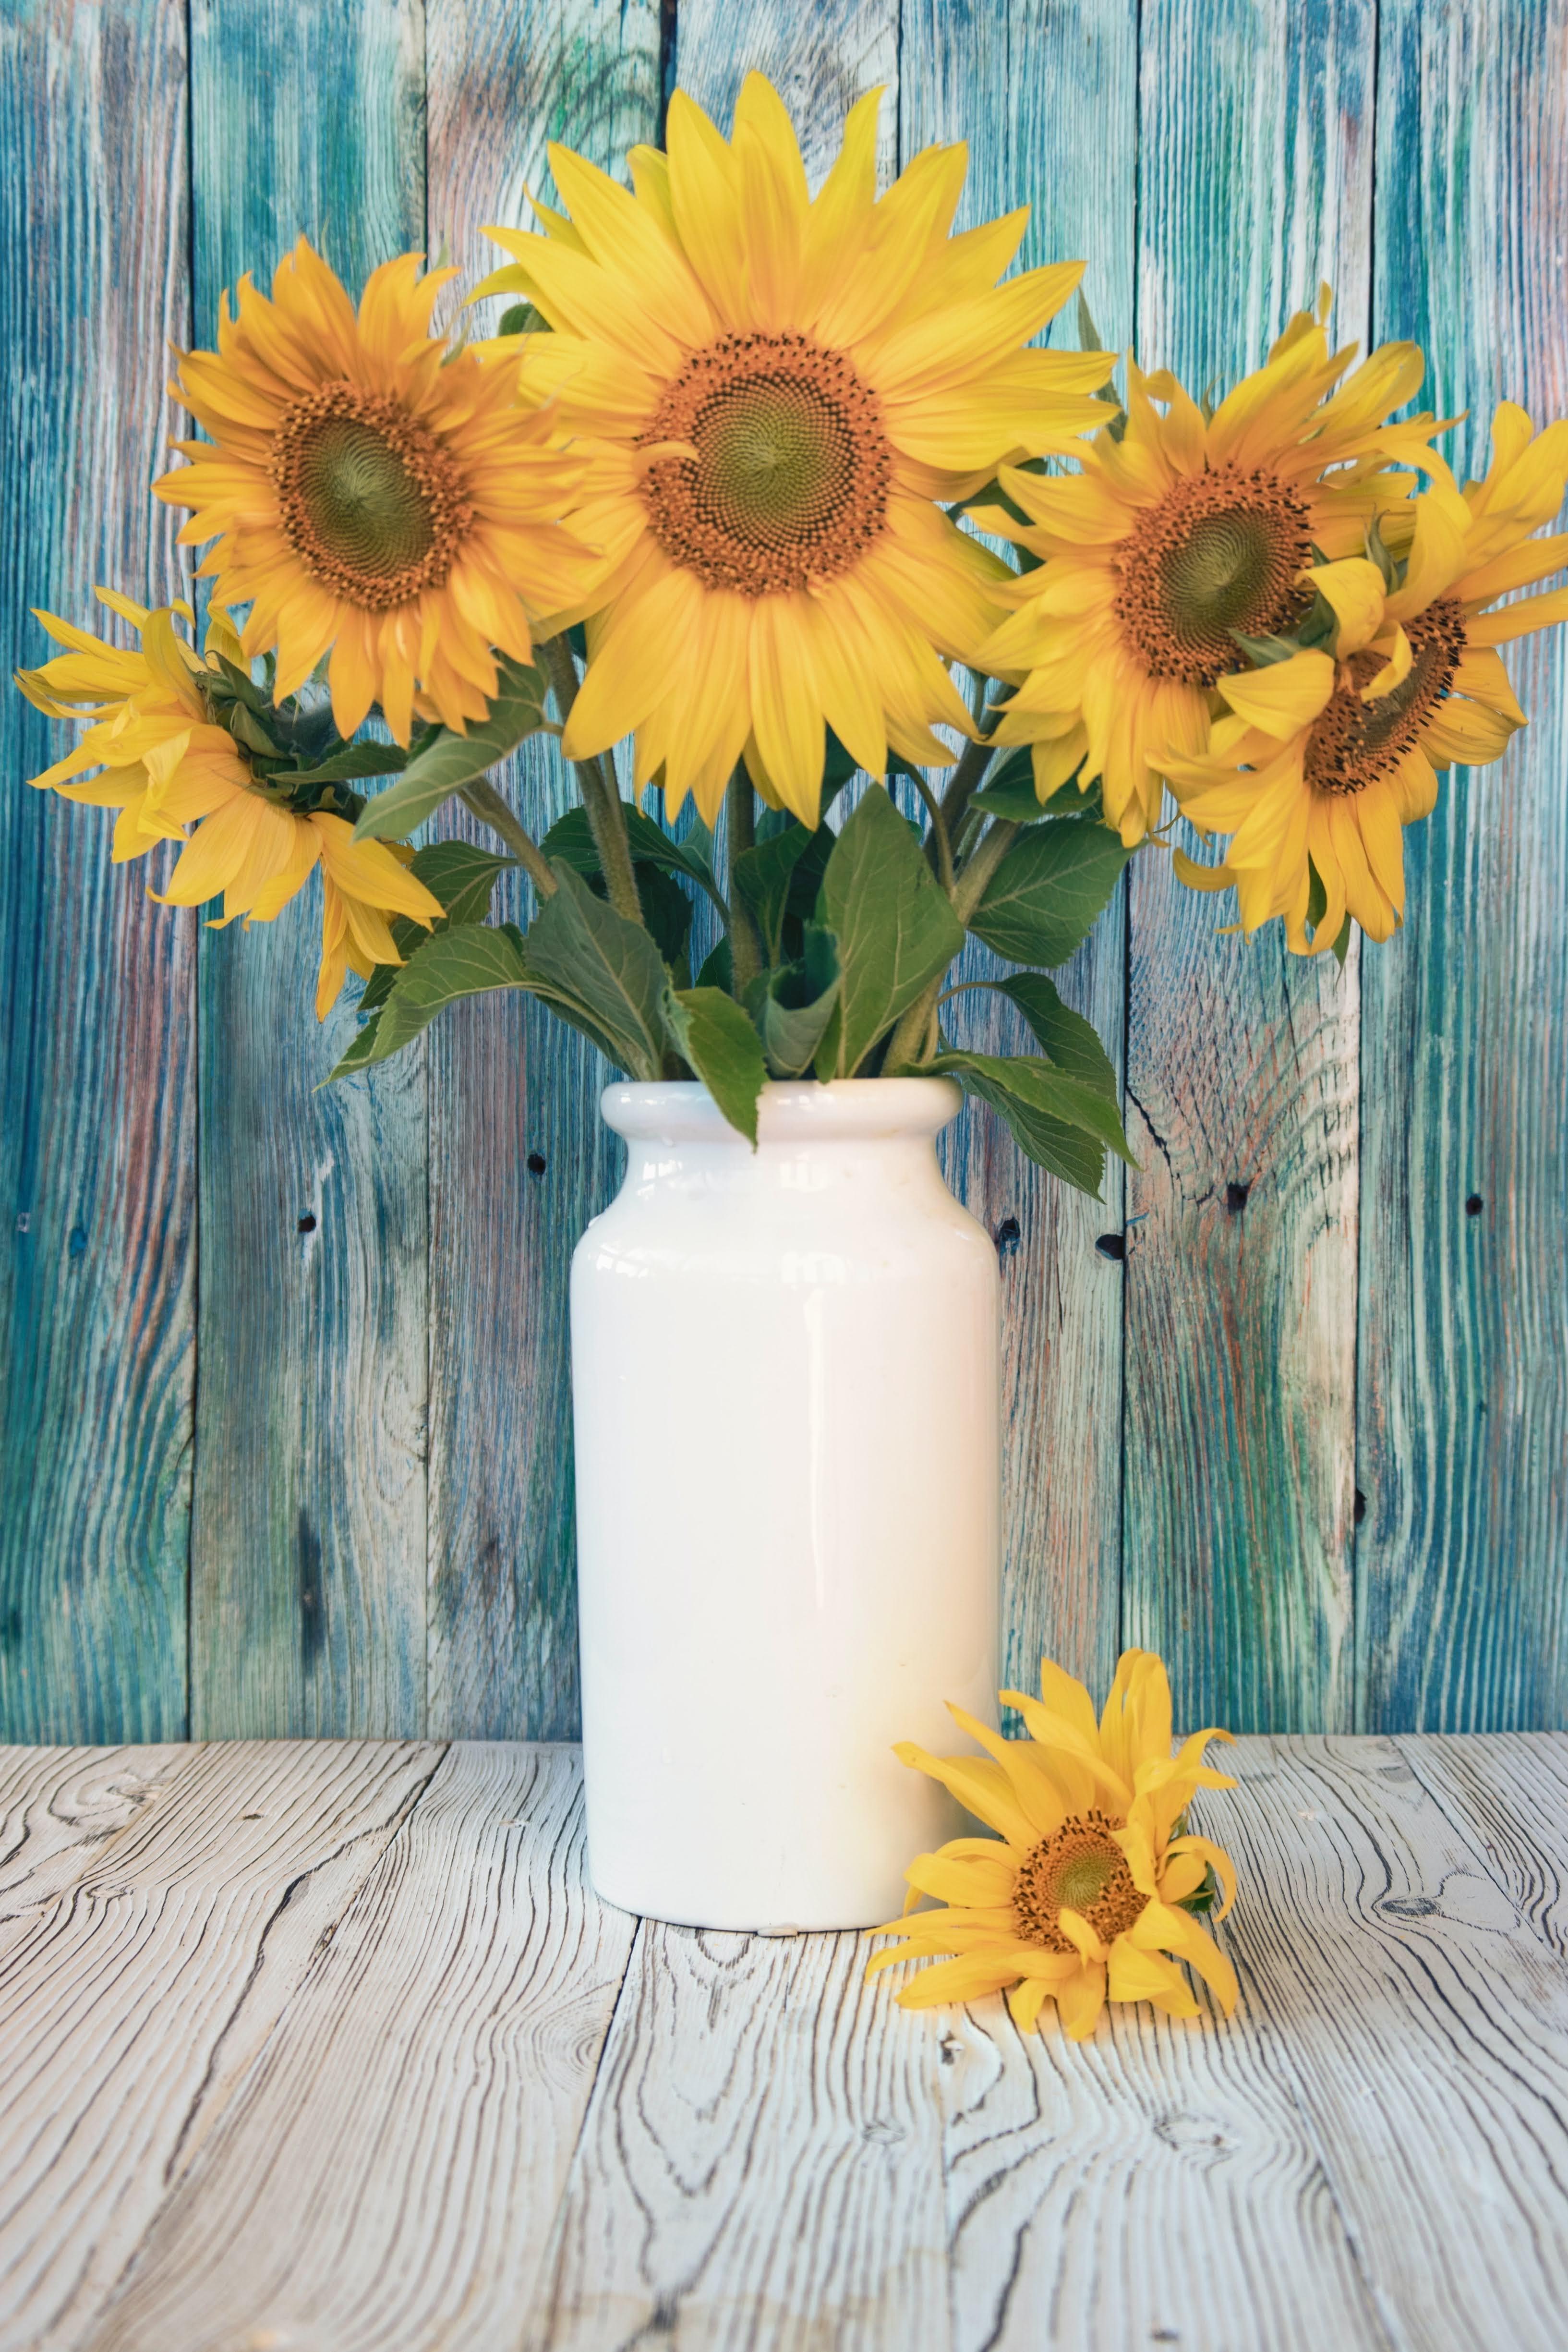 Yellow Sunflowers in White Ceramic Vase   Photo by Andrey Haimin via Unsplash